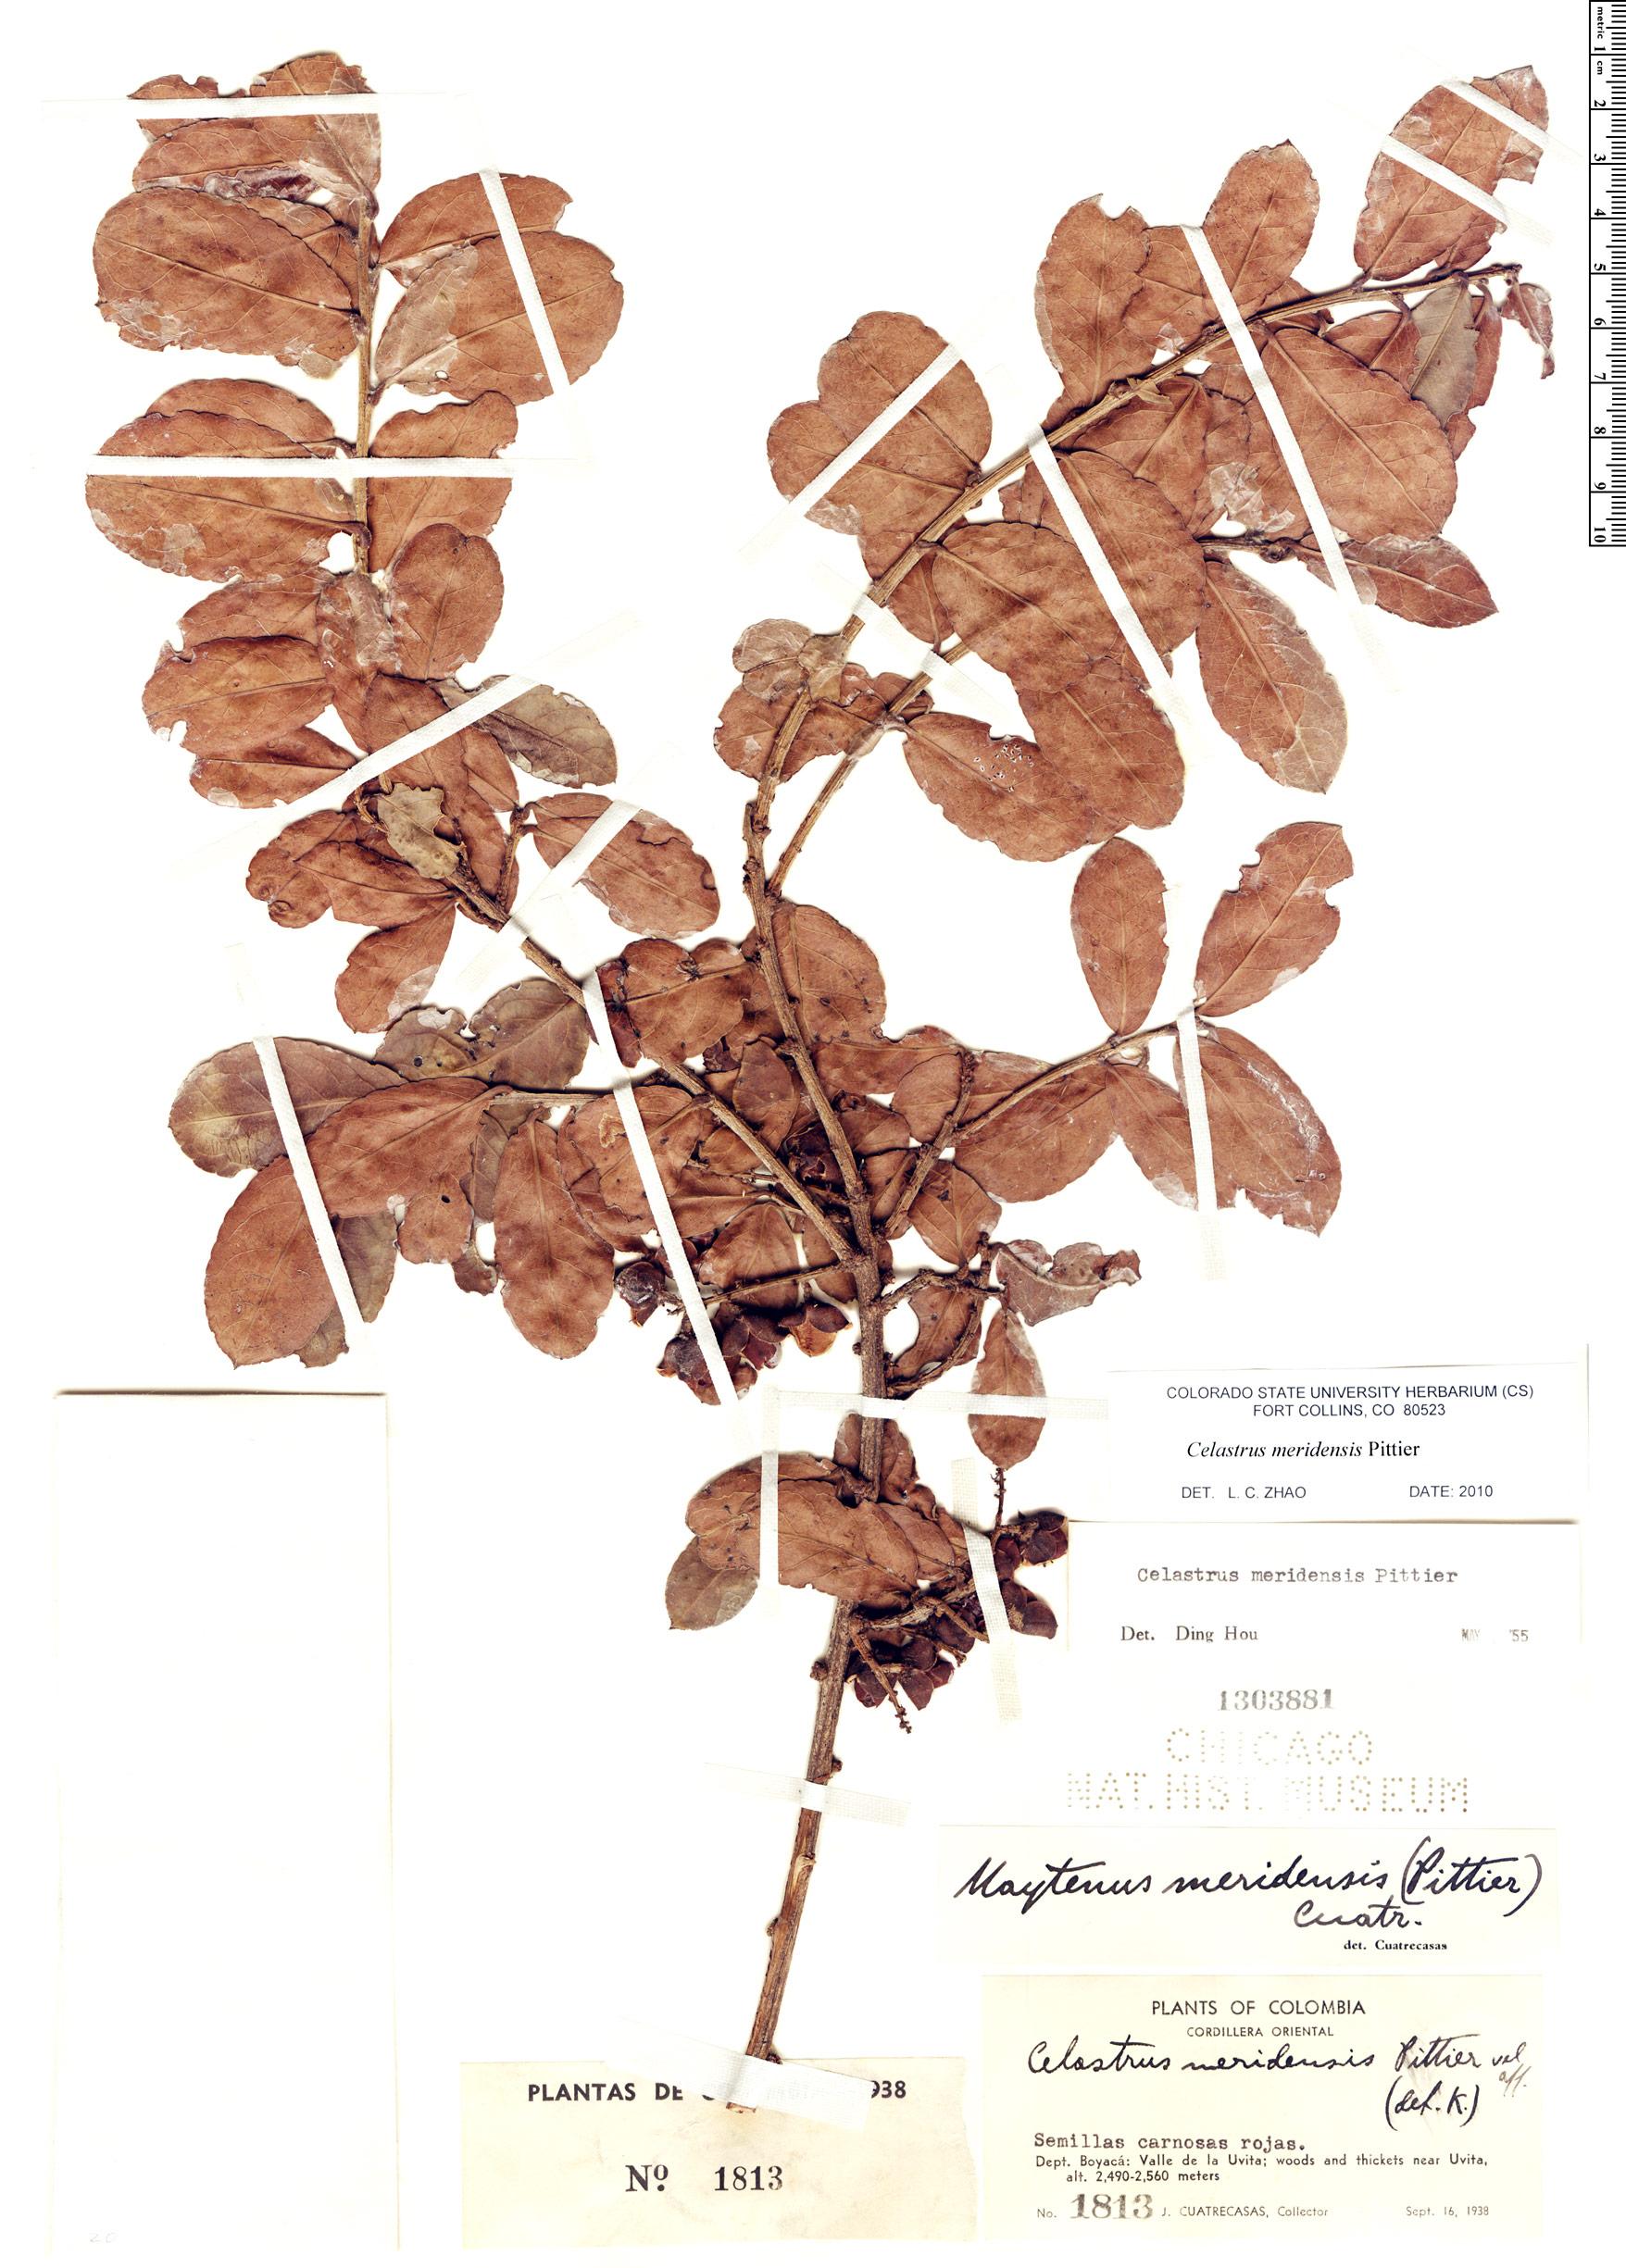 Specimen: Celastrus meridensis